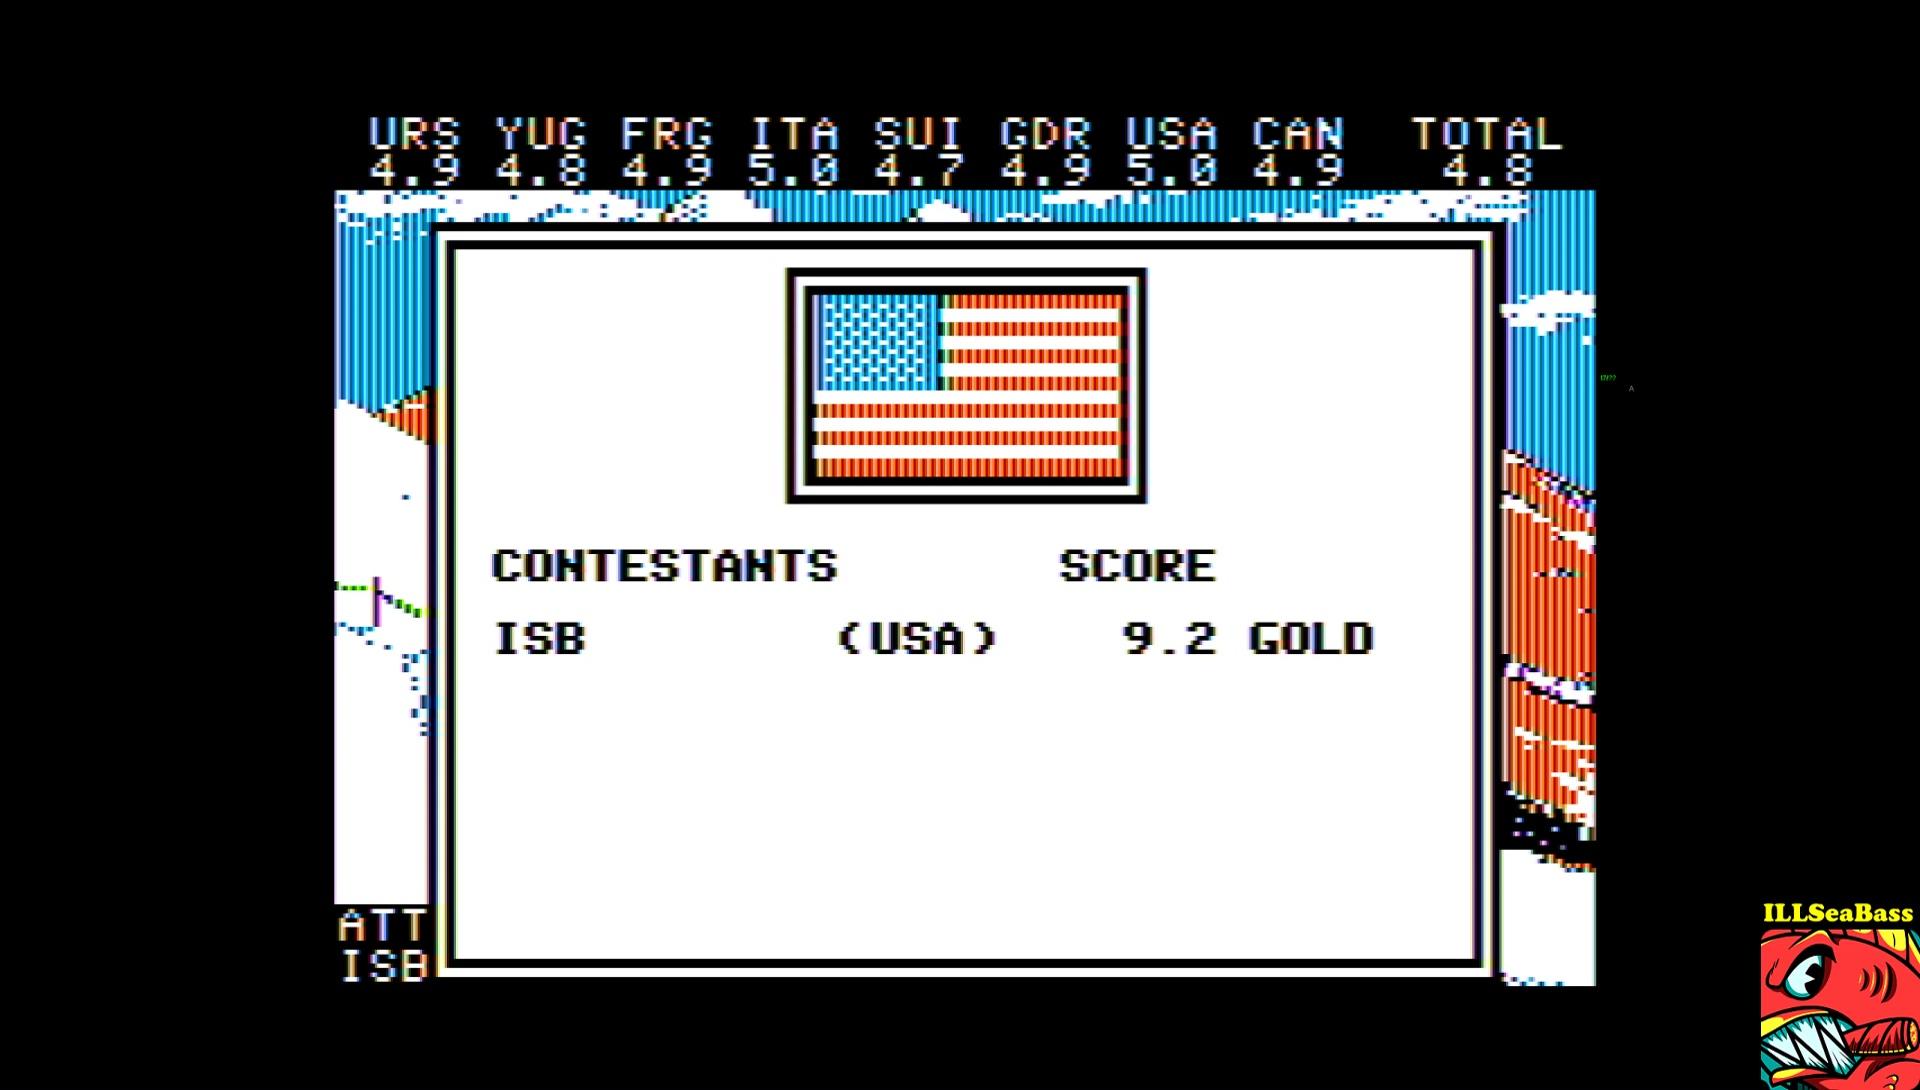 ILLSeaBass: Winter Games: Hot Dog (Apple II Emulated) 92 points on 2017-03-11 16:06:25